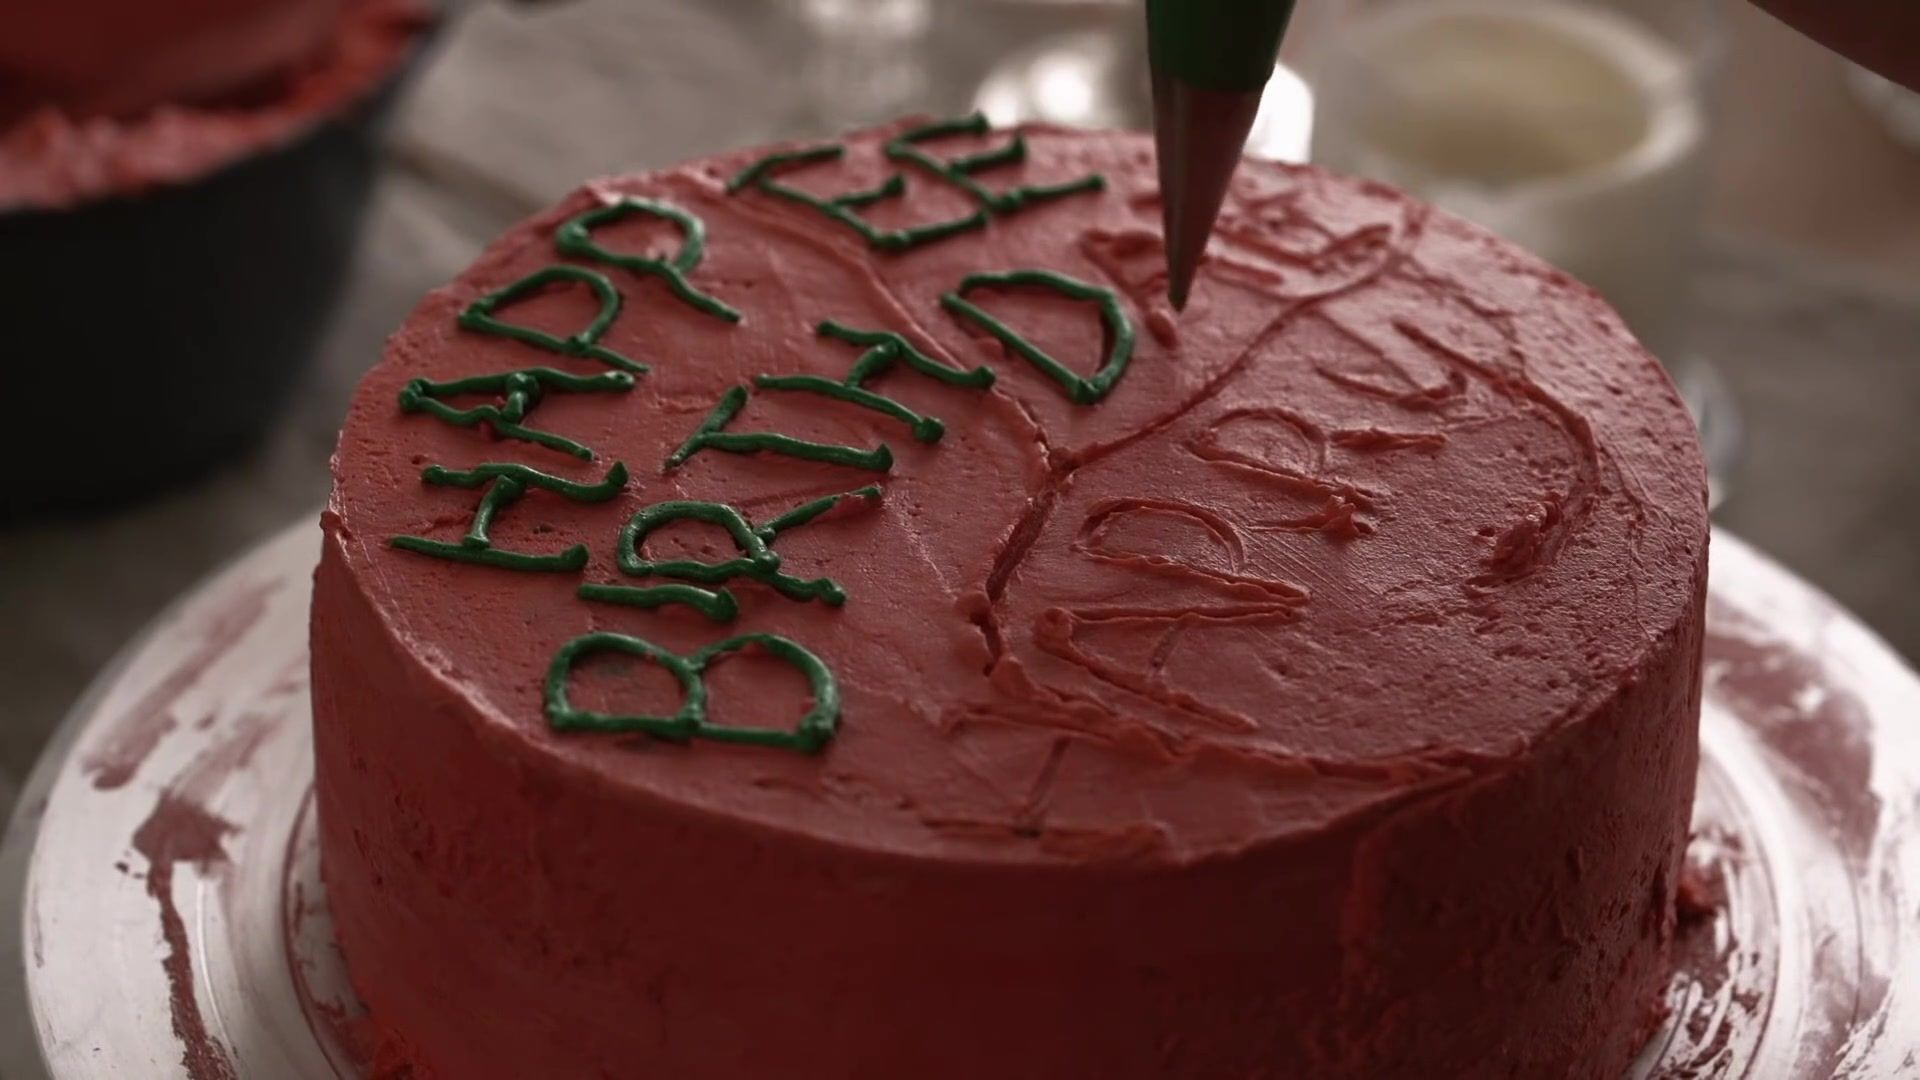 Honeykki Episode 99 Harry Potters Birthday Cake From Hagrid